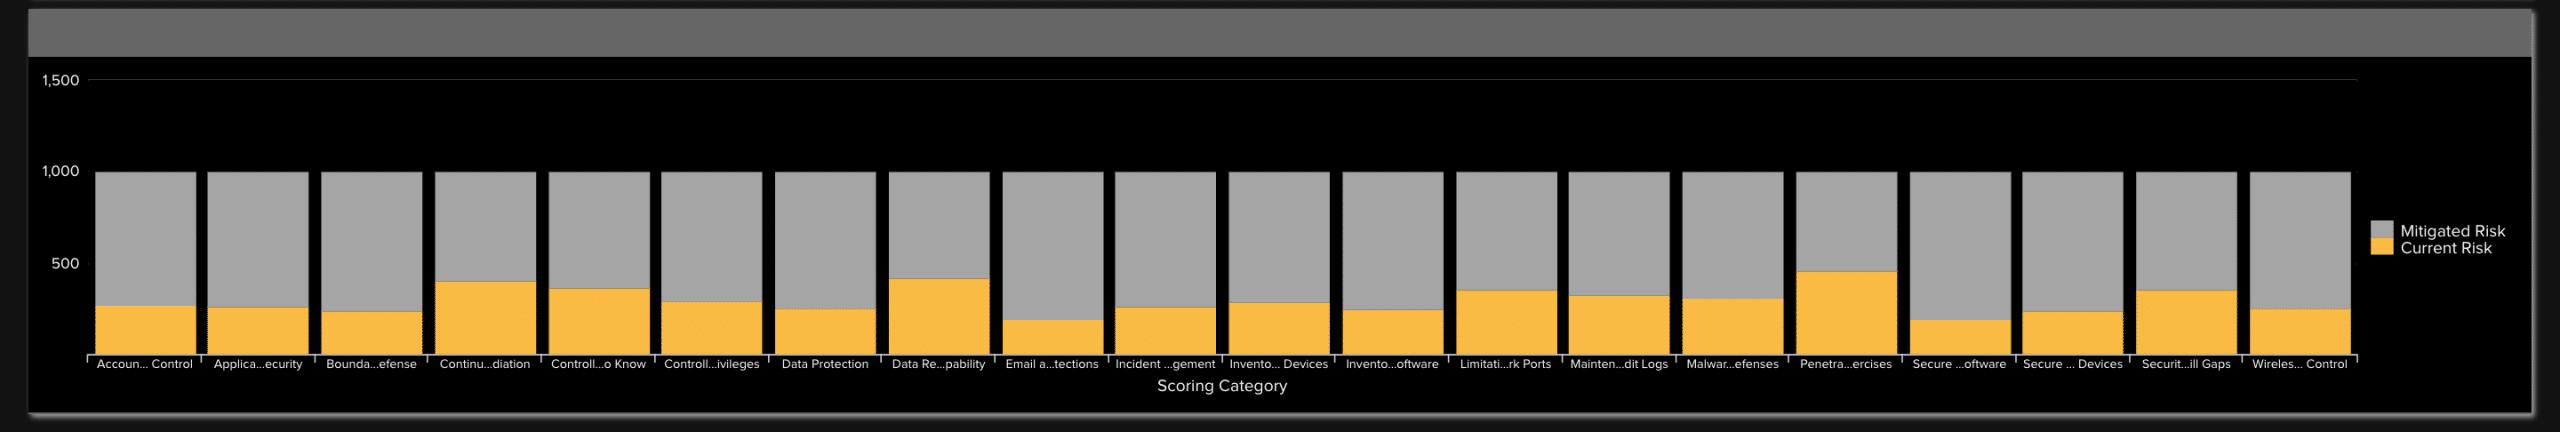 Risk Scorecard Column Chart